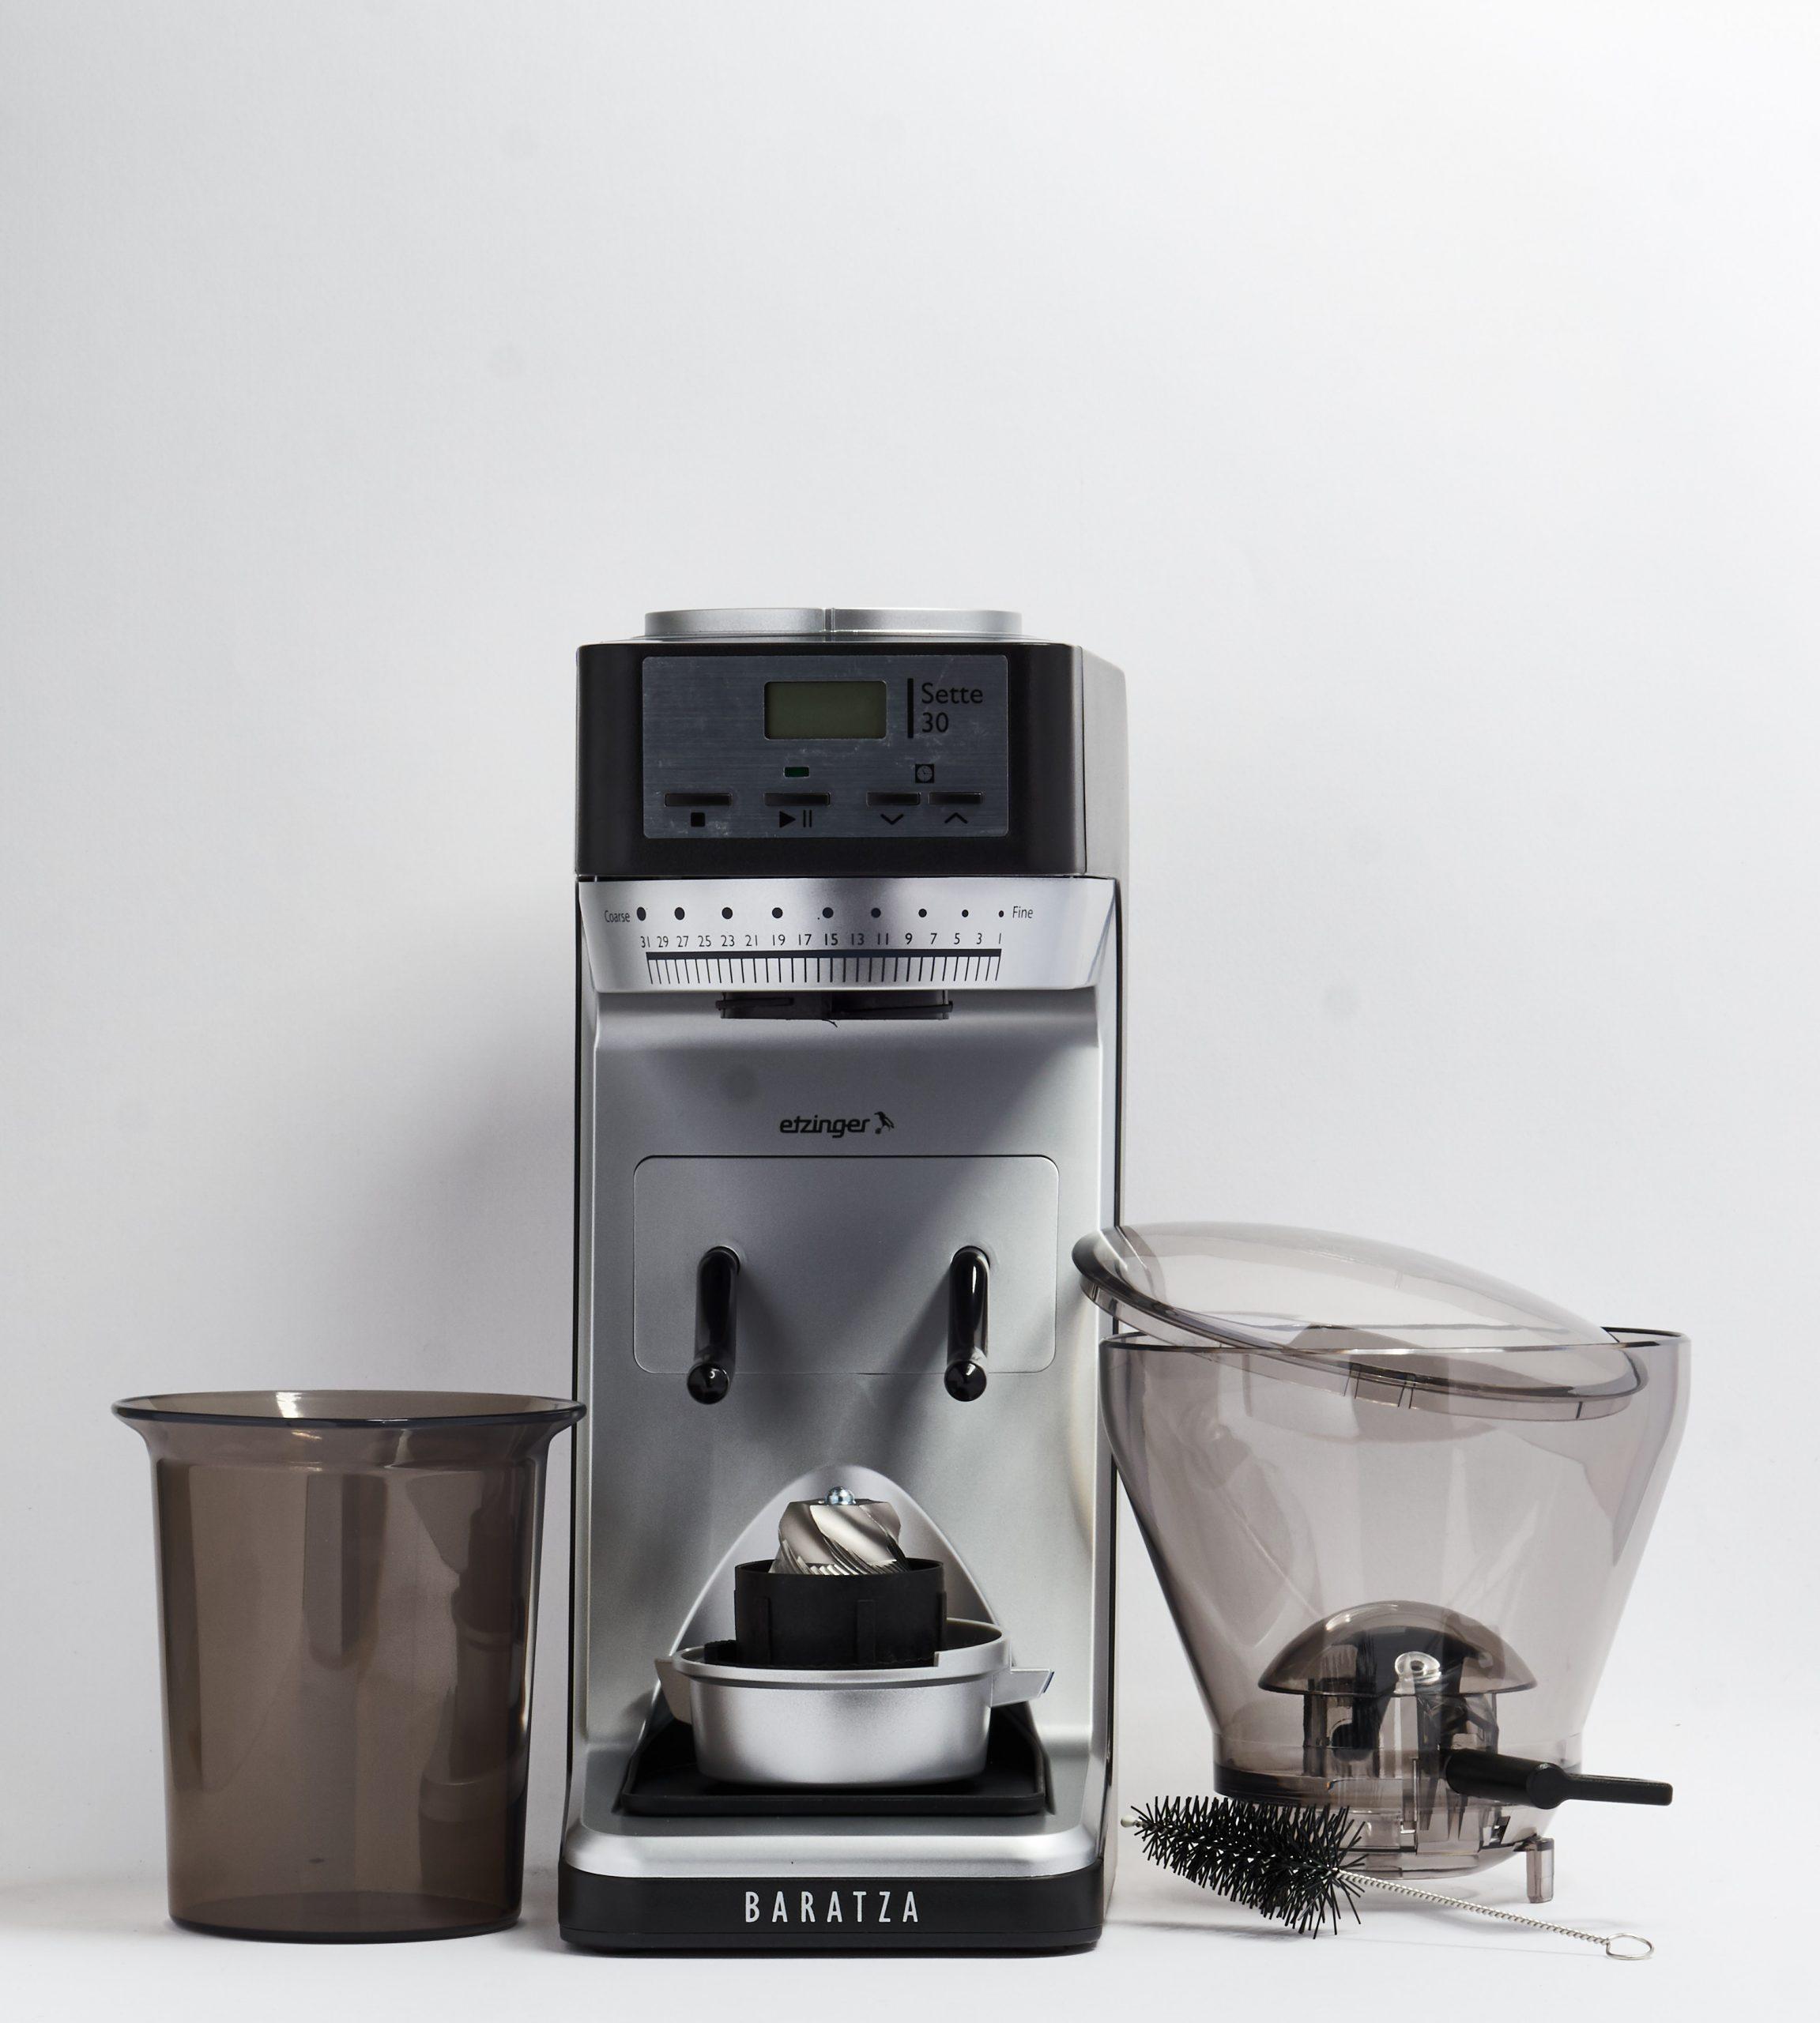 Sette 30 AP, elektrische Kaffeemühle-prev-6